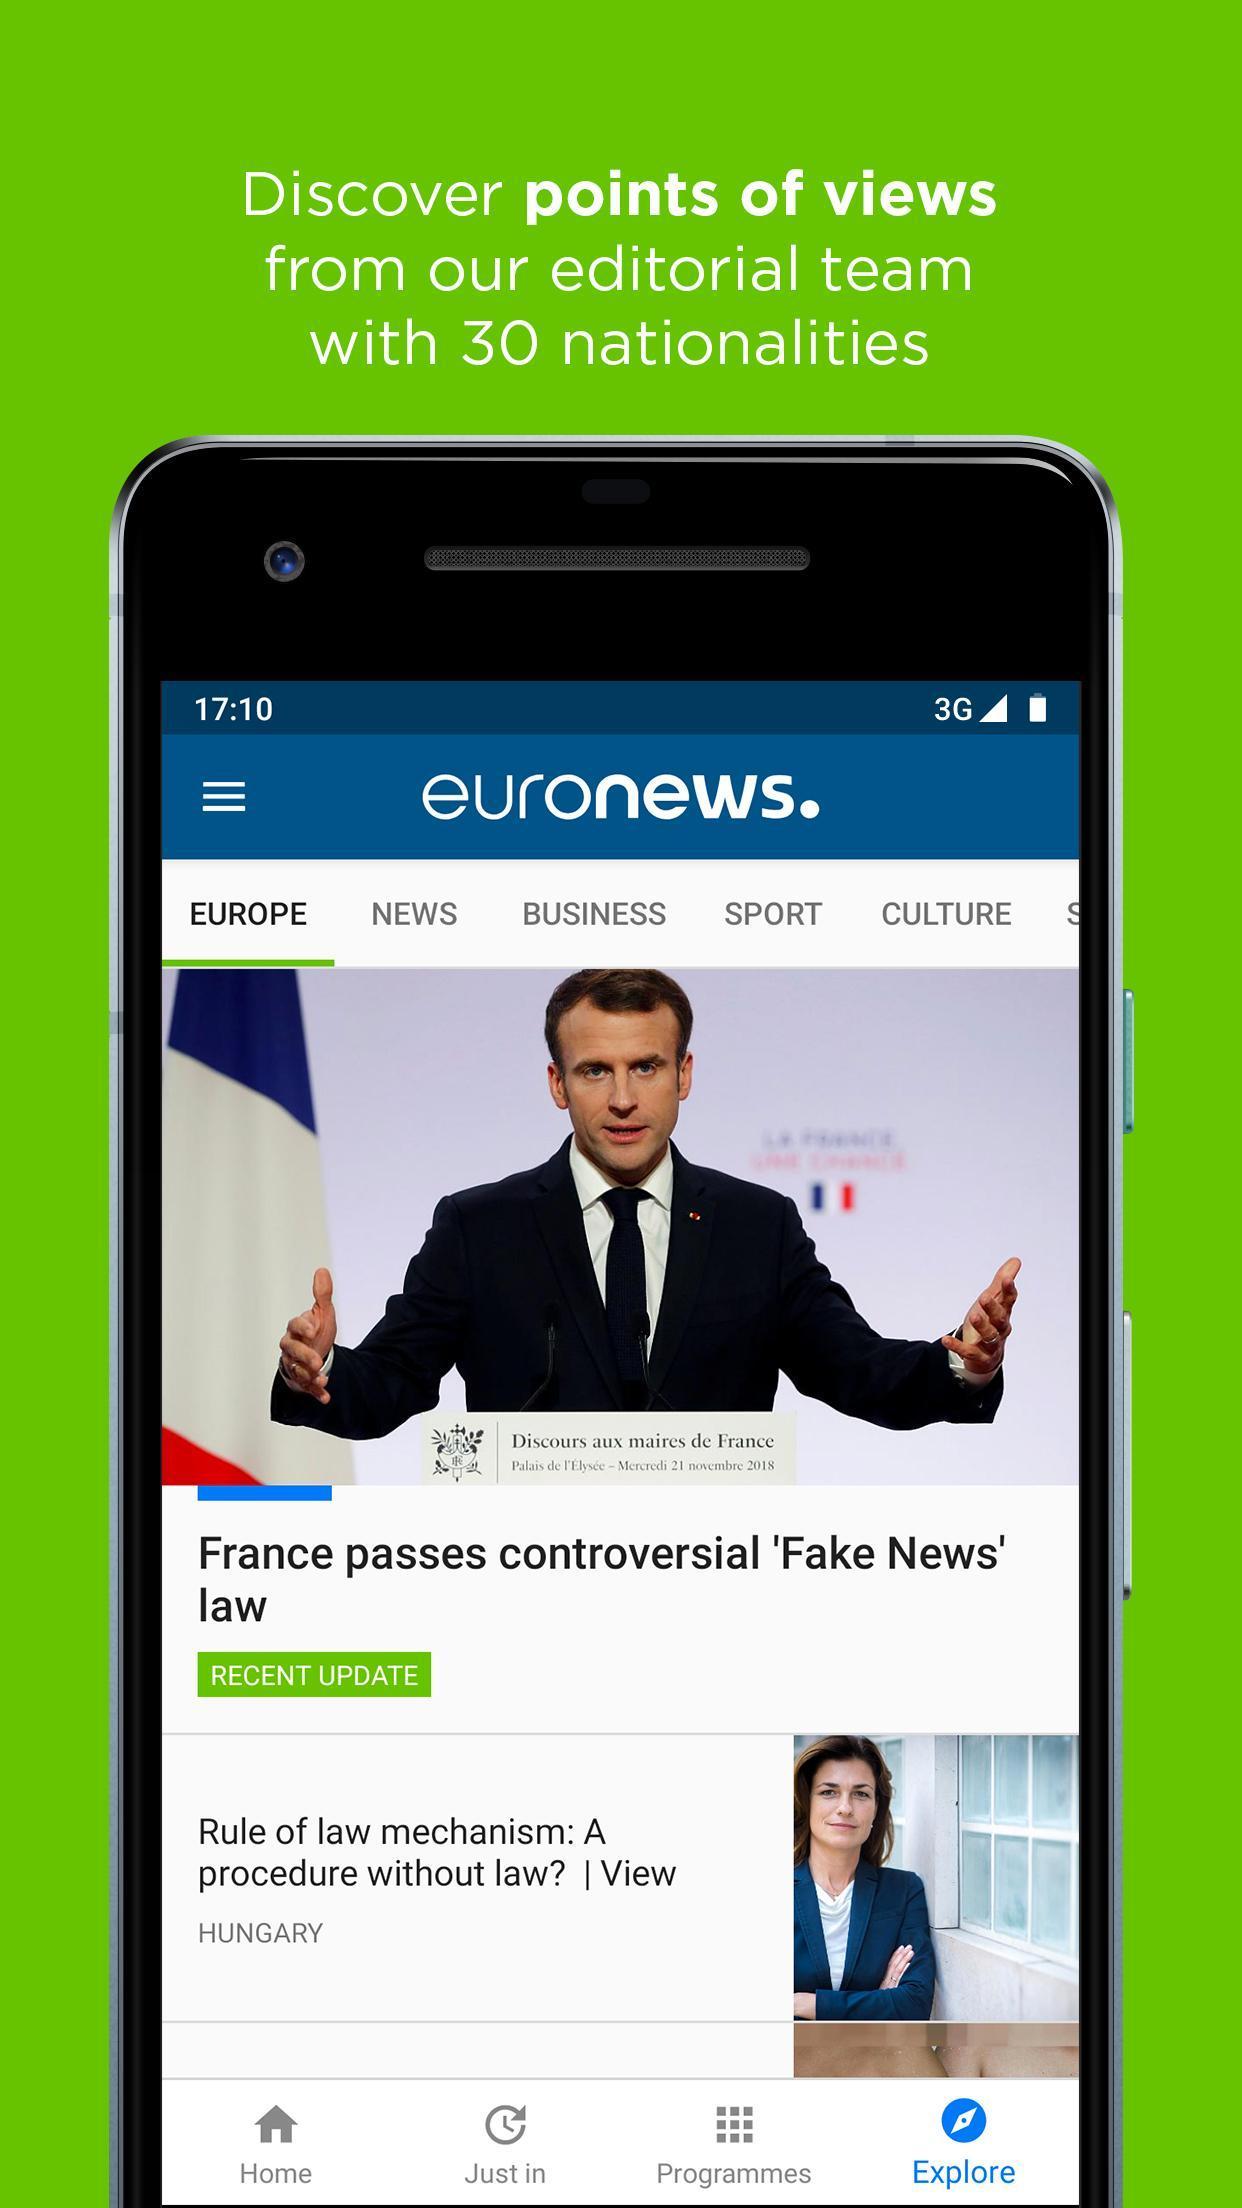 Euronews Daily breaking world news & Live TV 5.2.1 Screenshot 8